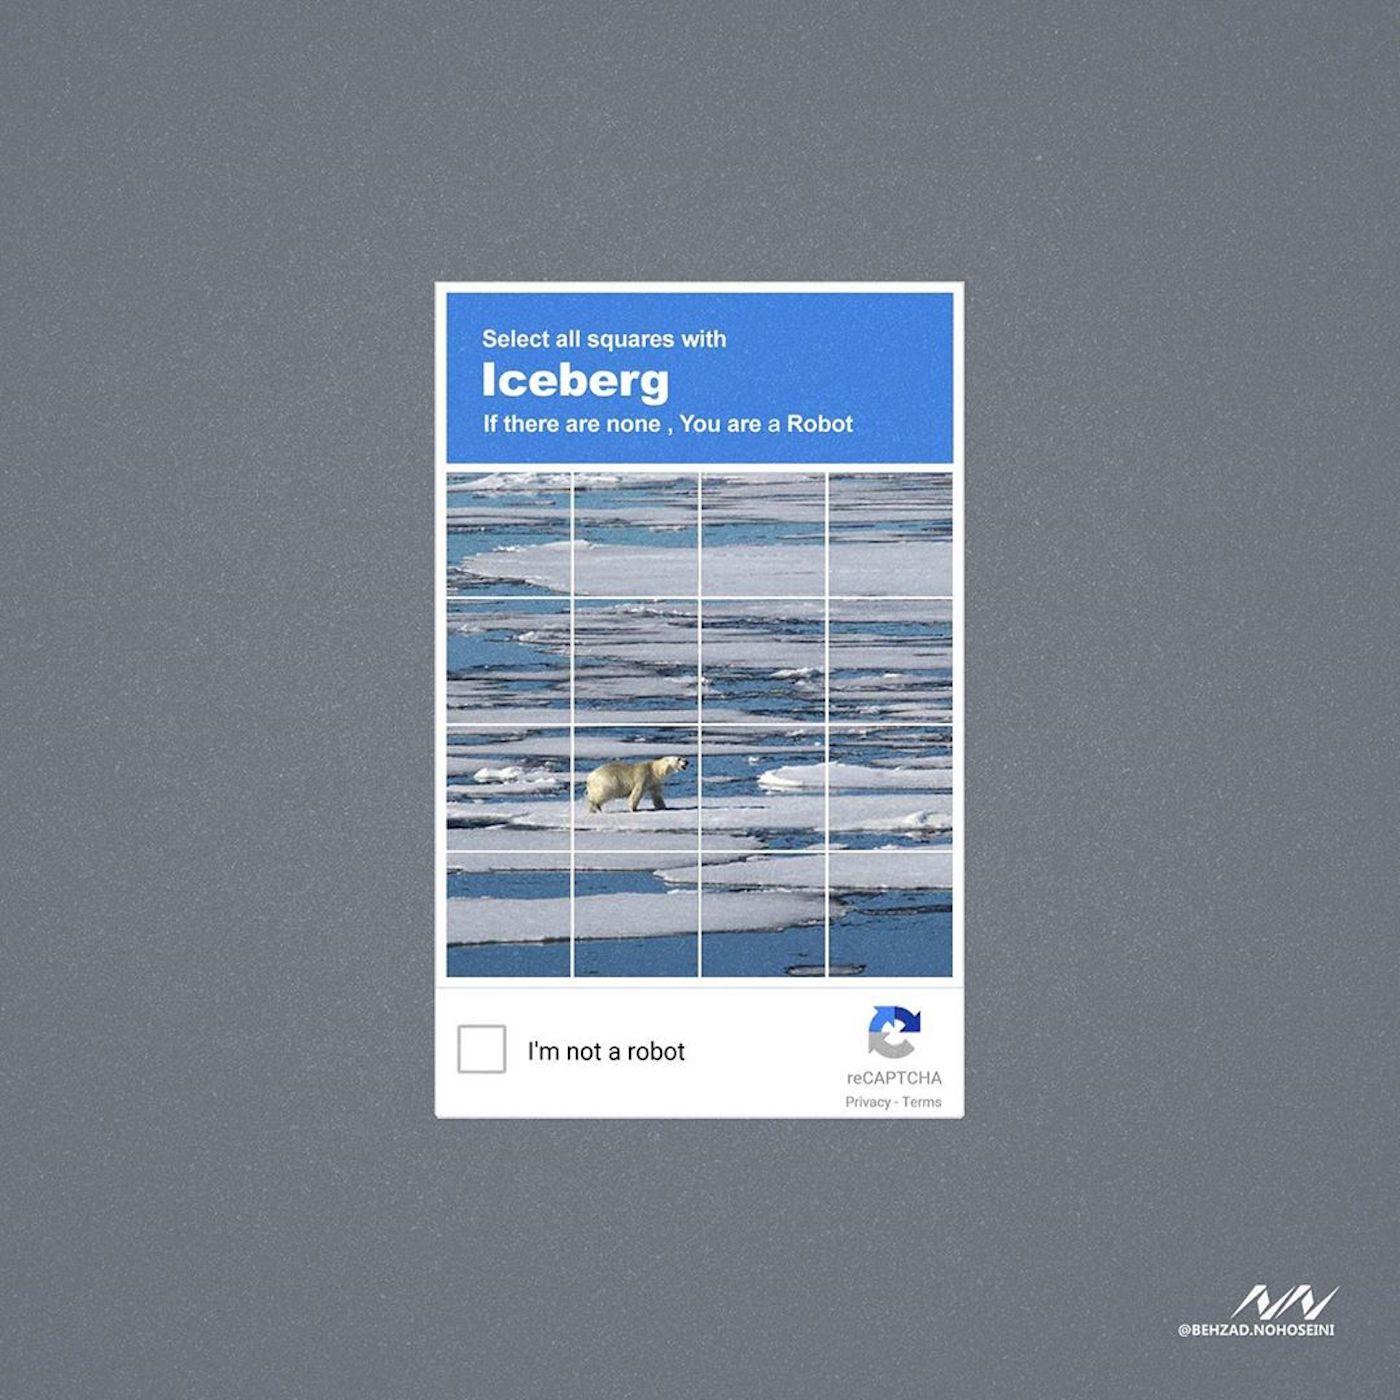 captcha-iceberg